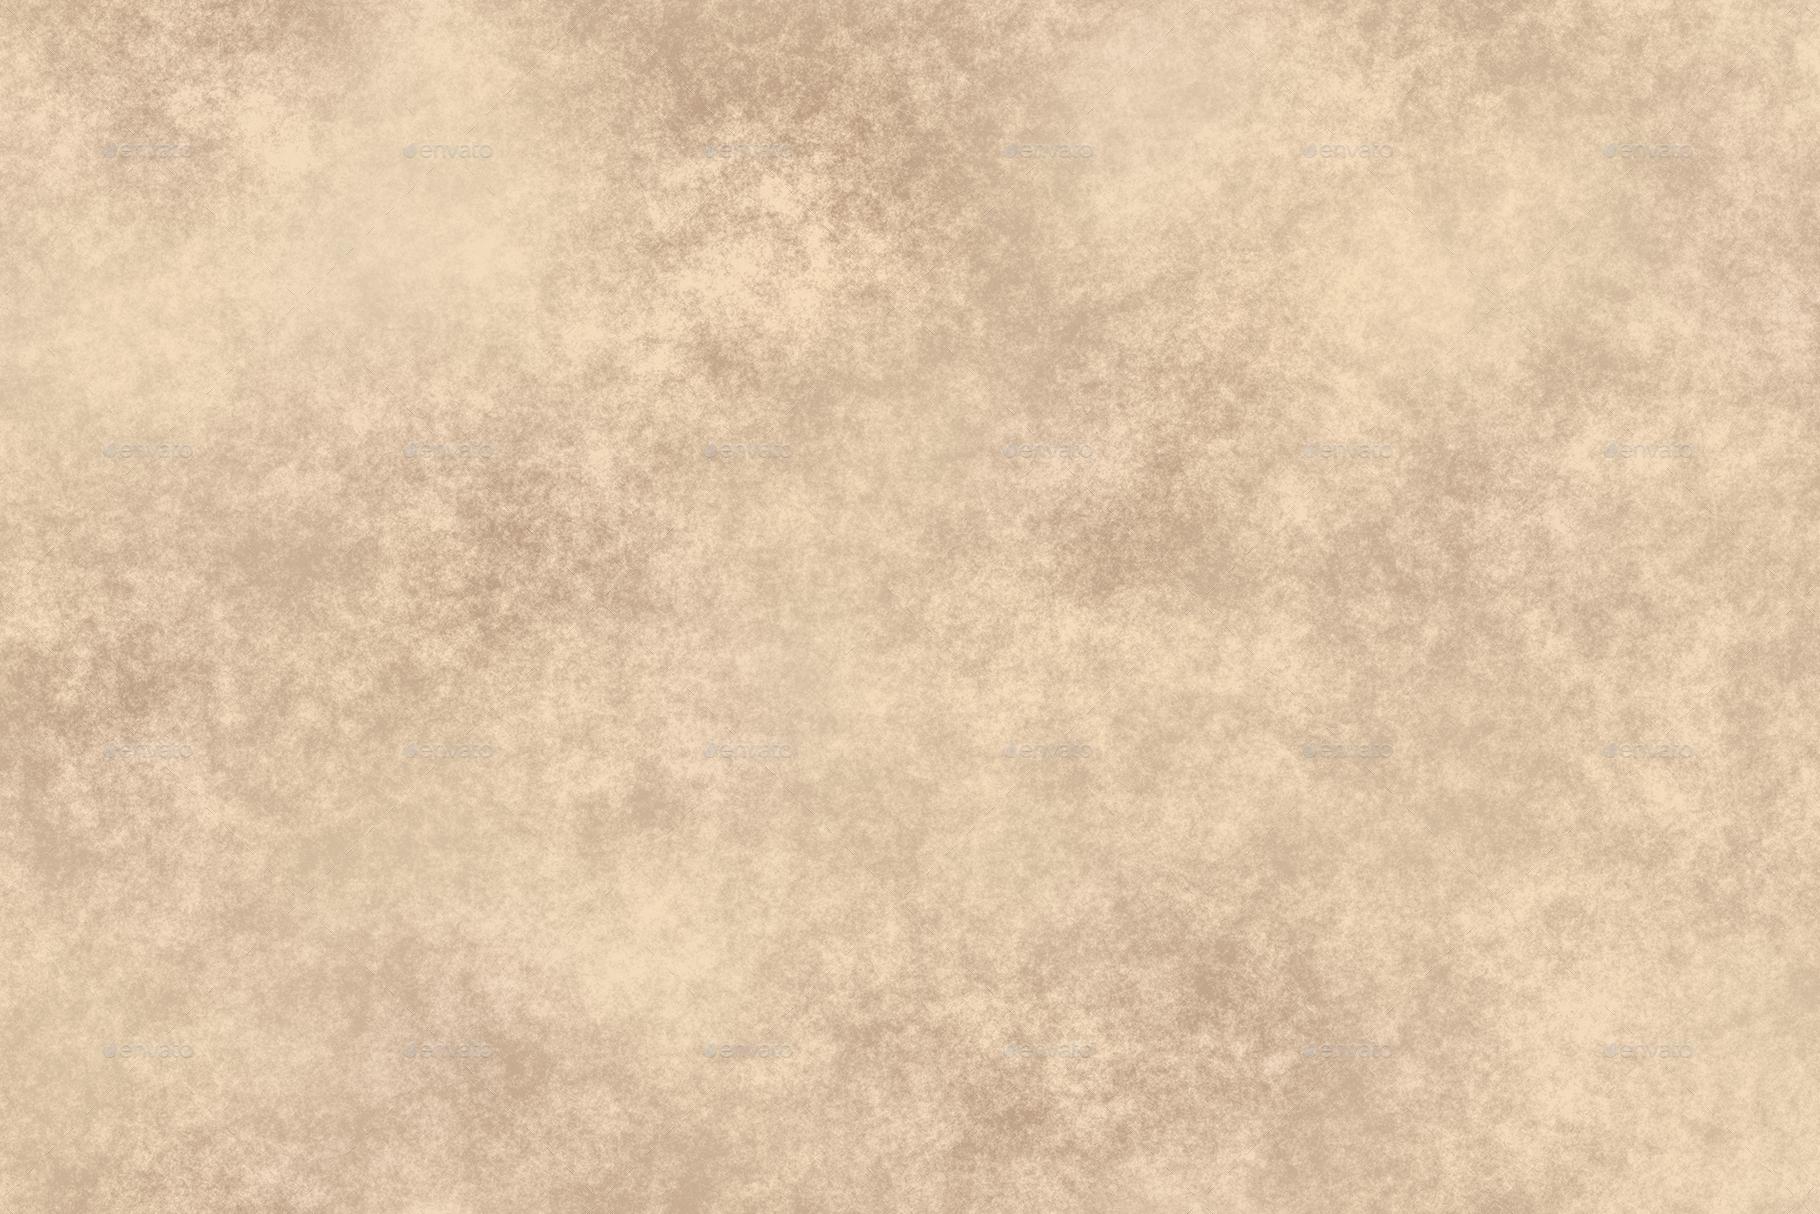 10 skull bone background textures by webcombo